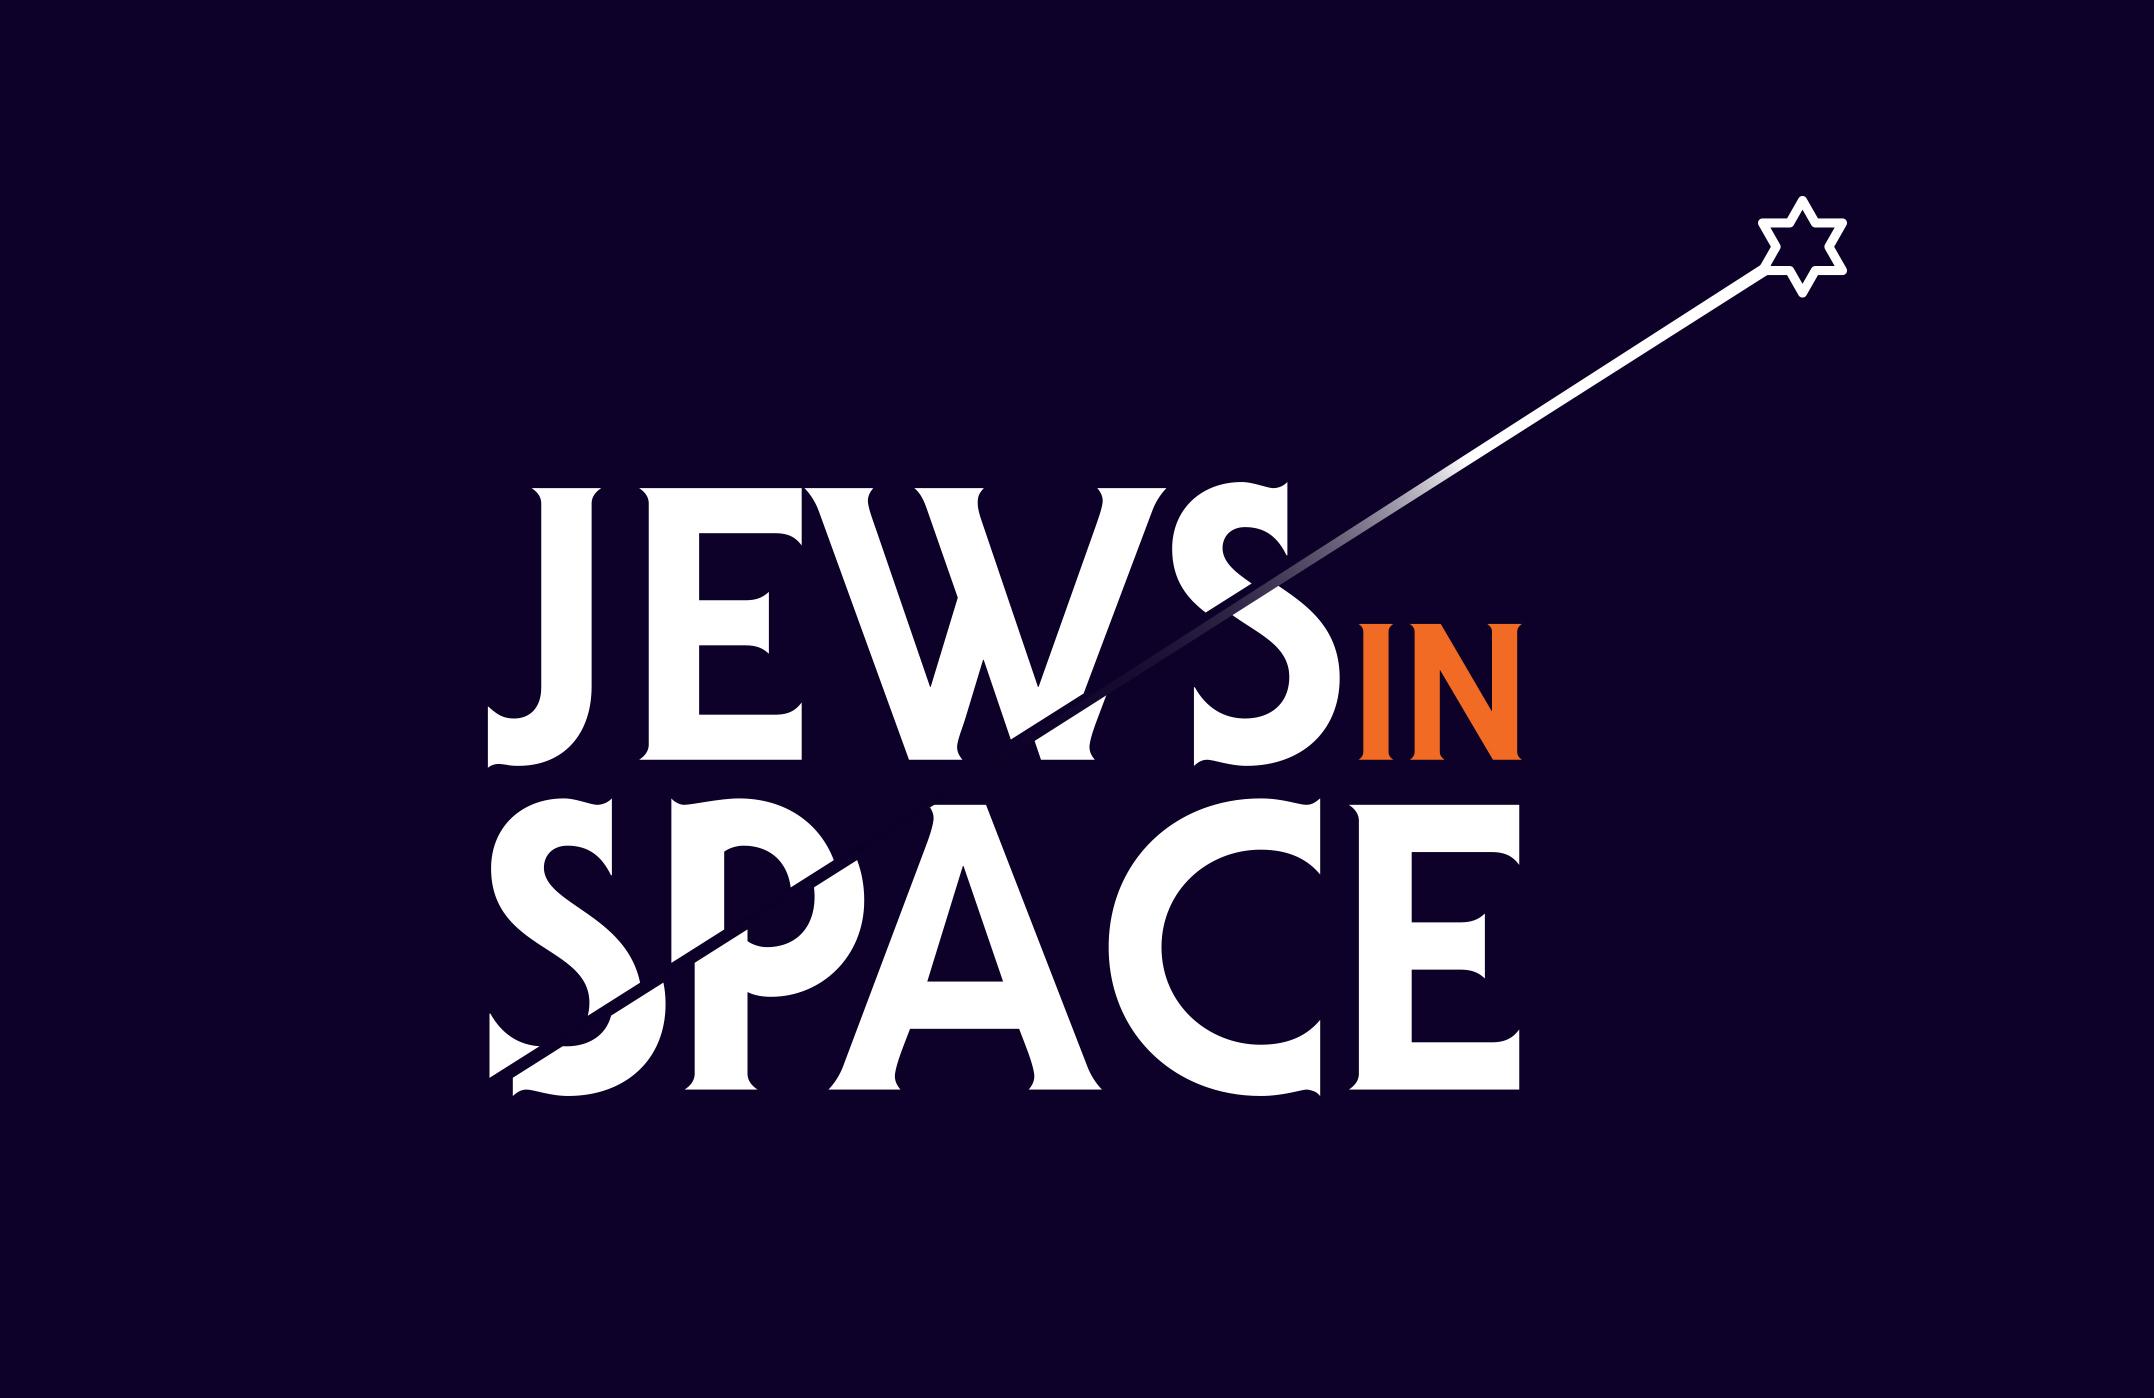 jews in space logo.jpg